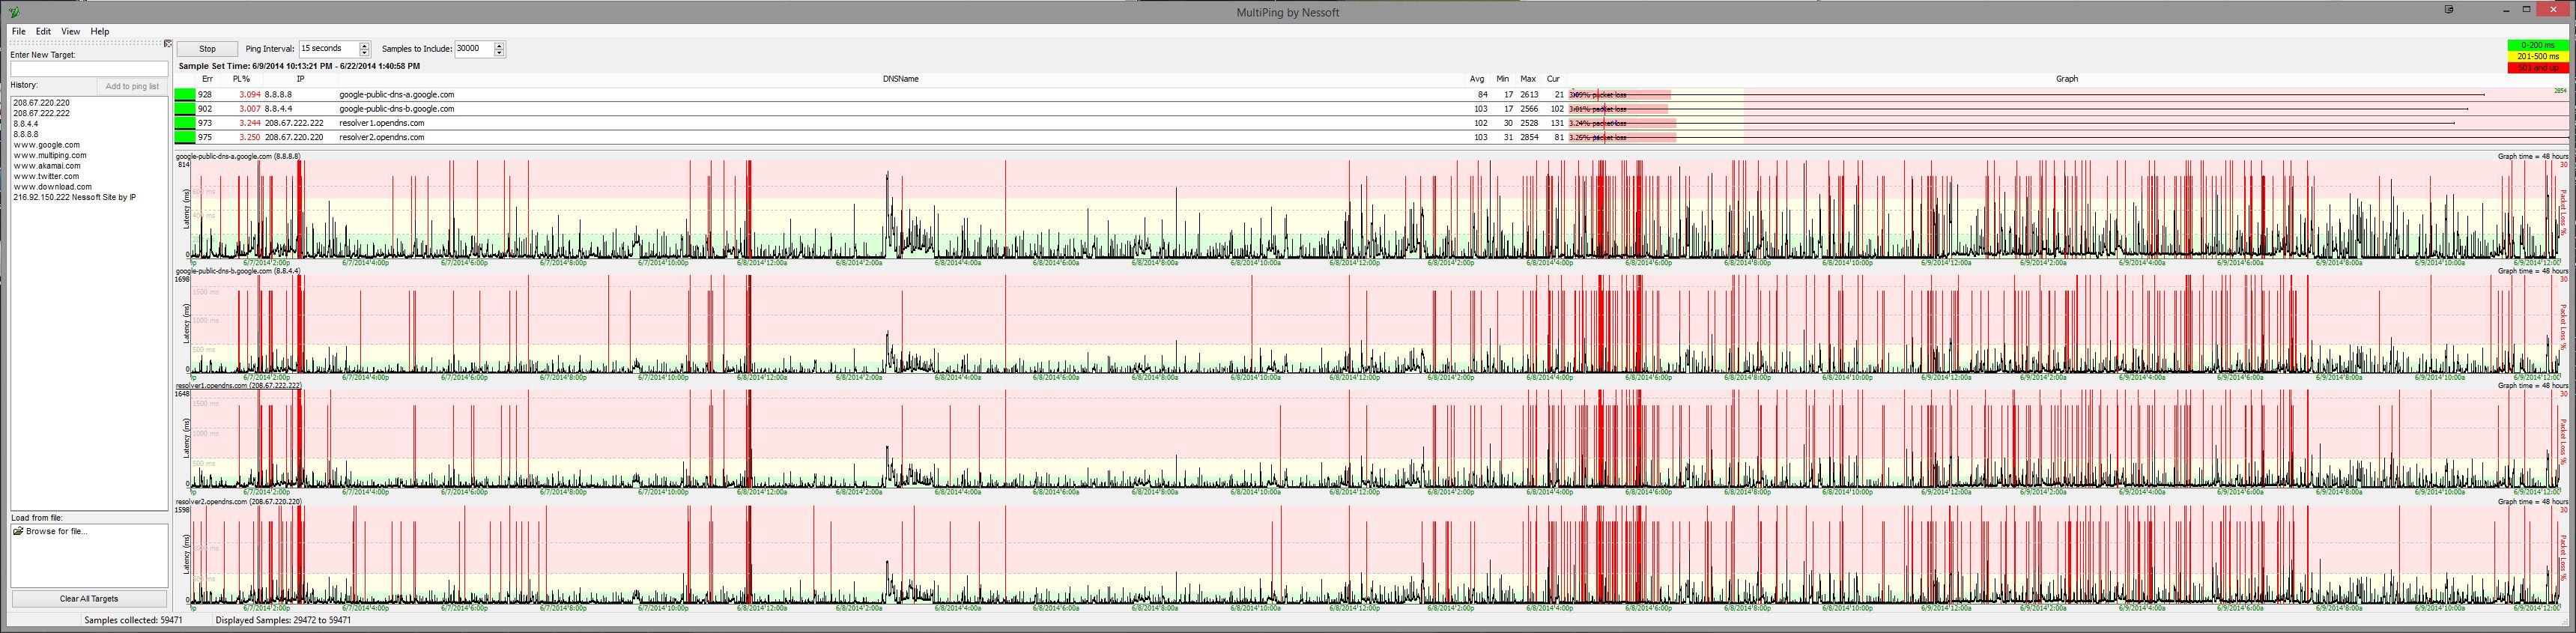 Comcast-Multiping 5.JPG